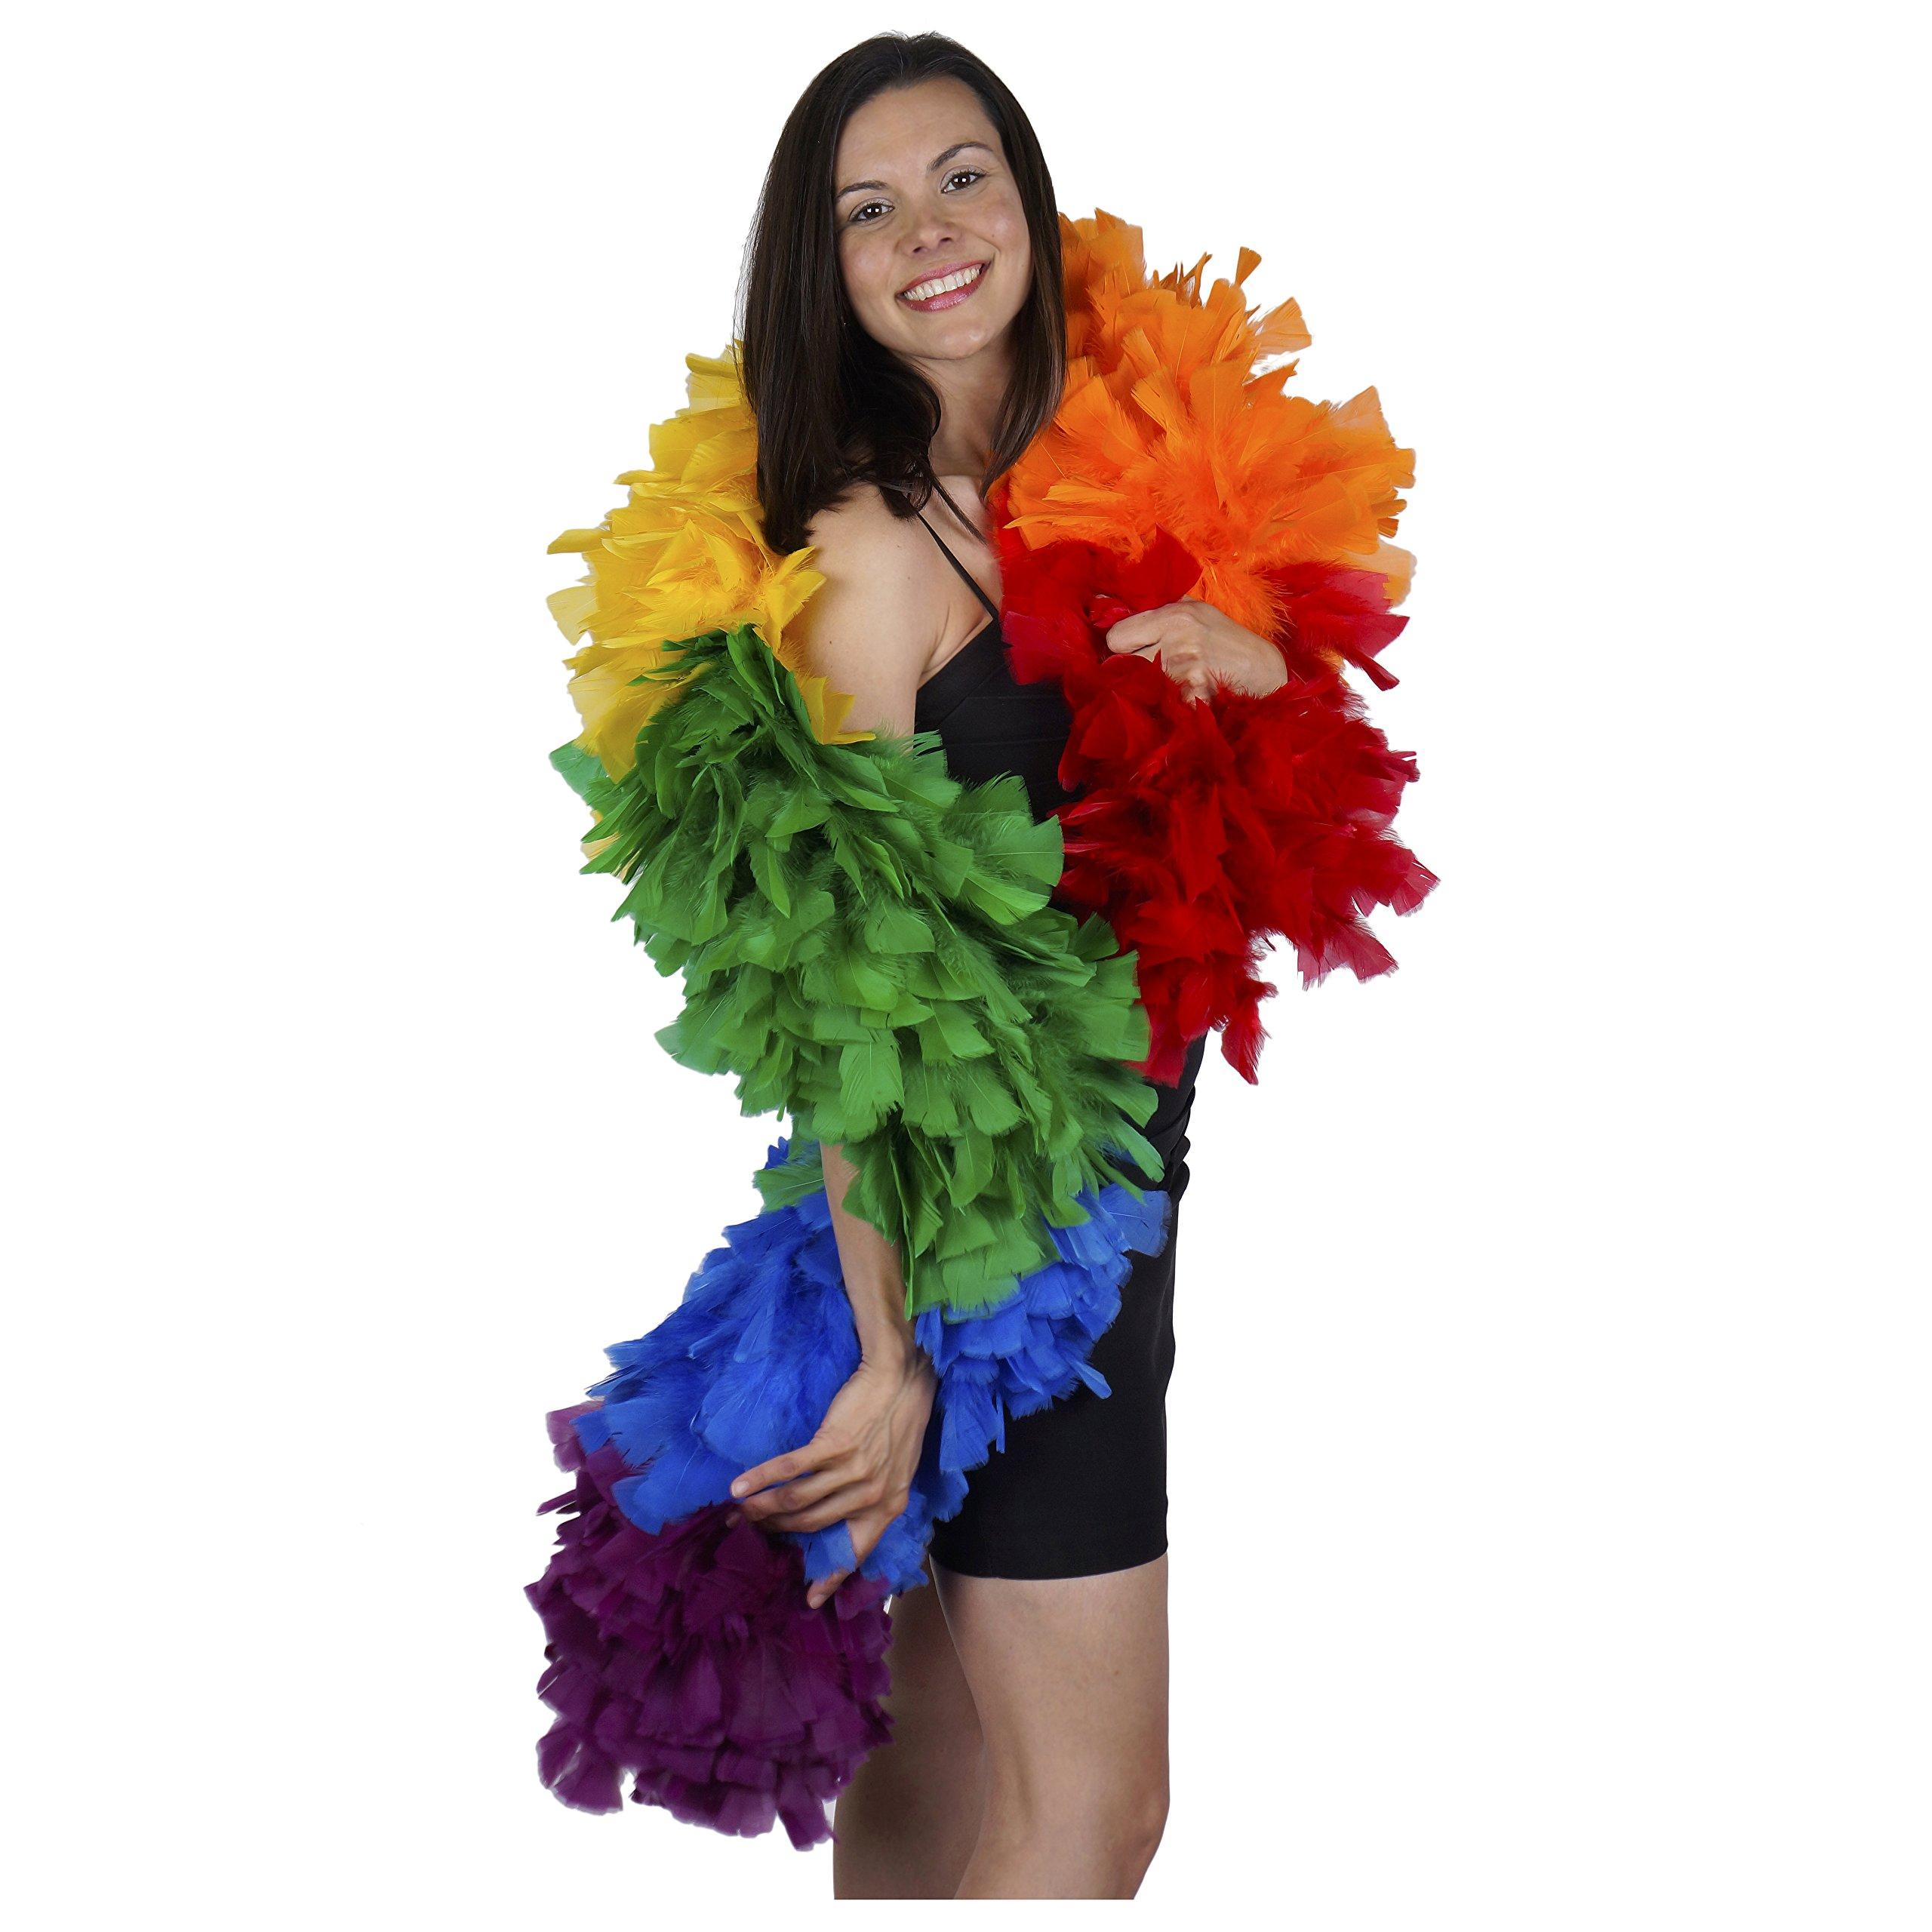 Zucker Feather (TM) - Turkey Boas Sectional Colors - Rainbow Mix